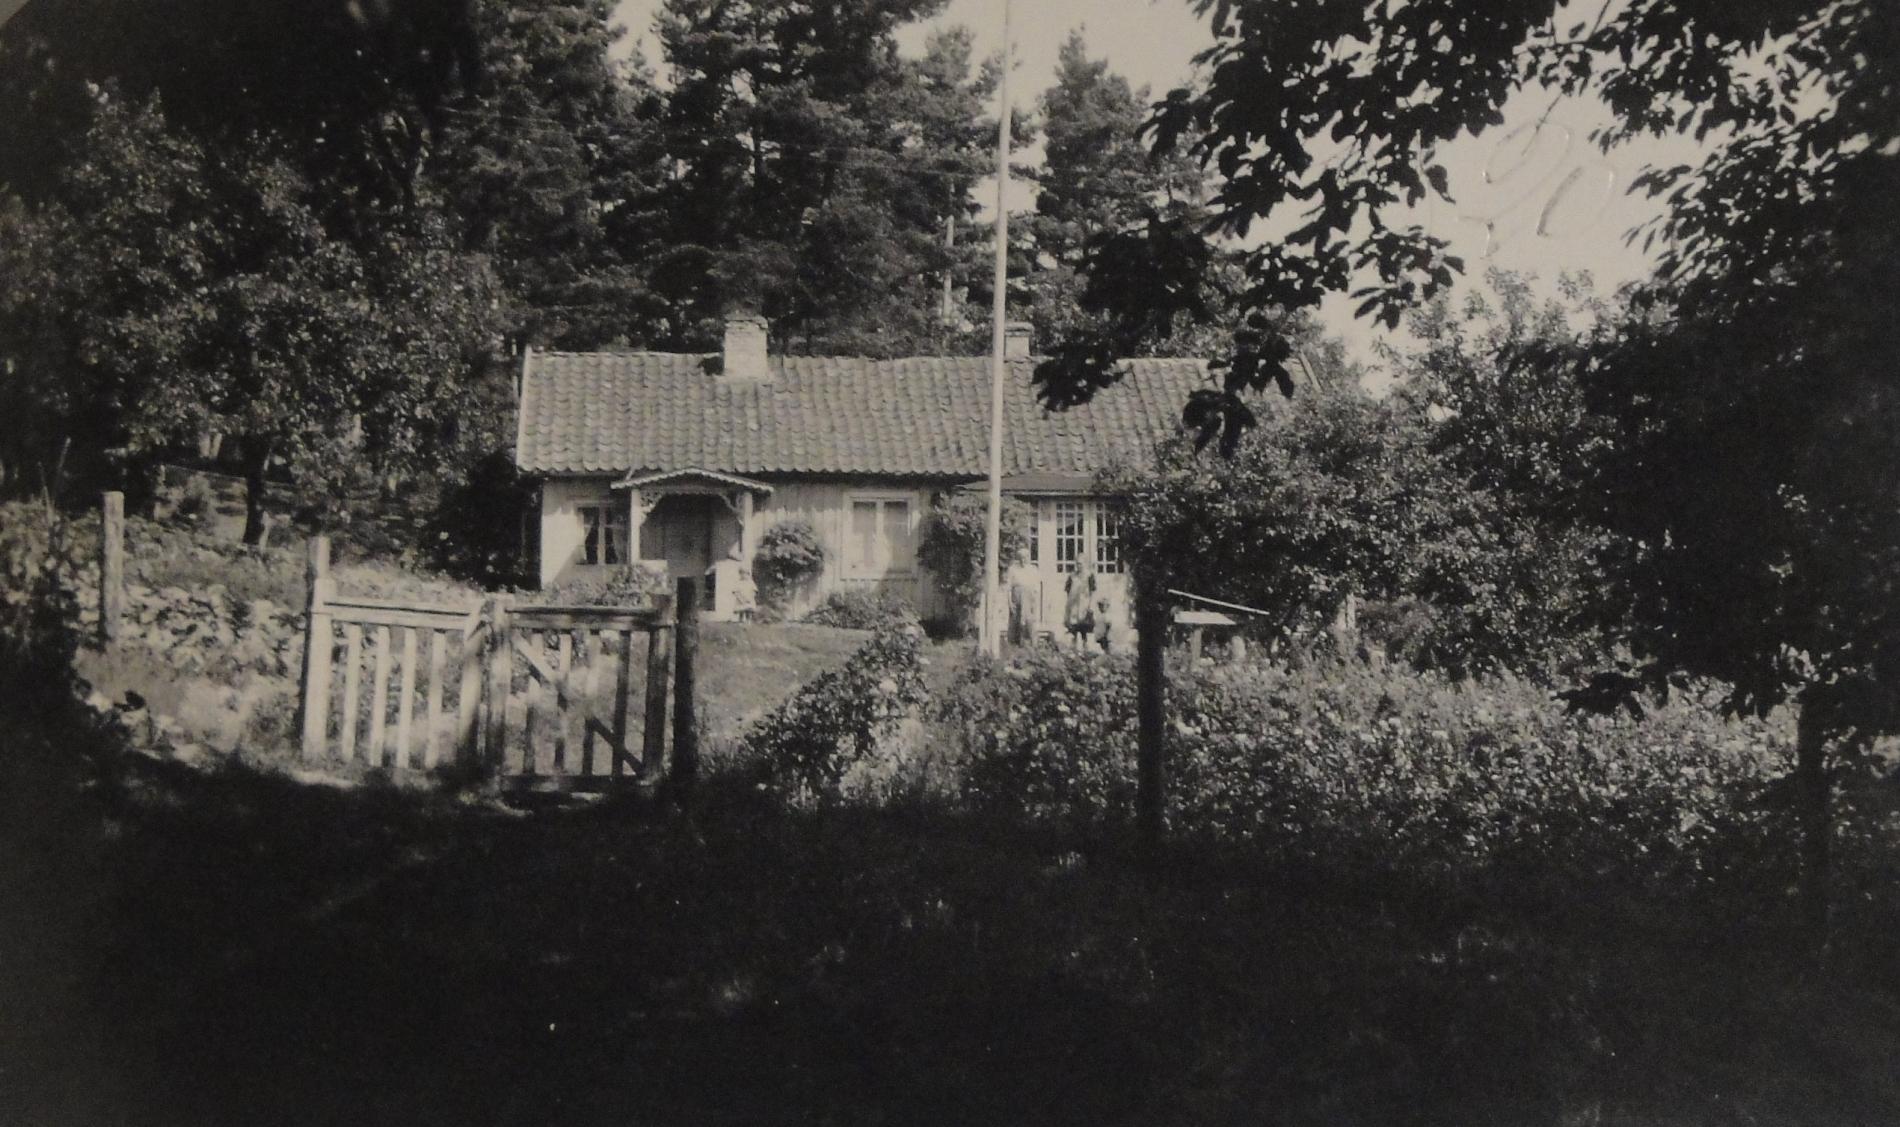 L Ekeryd, Banhem Ulrik & Christina Andersson